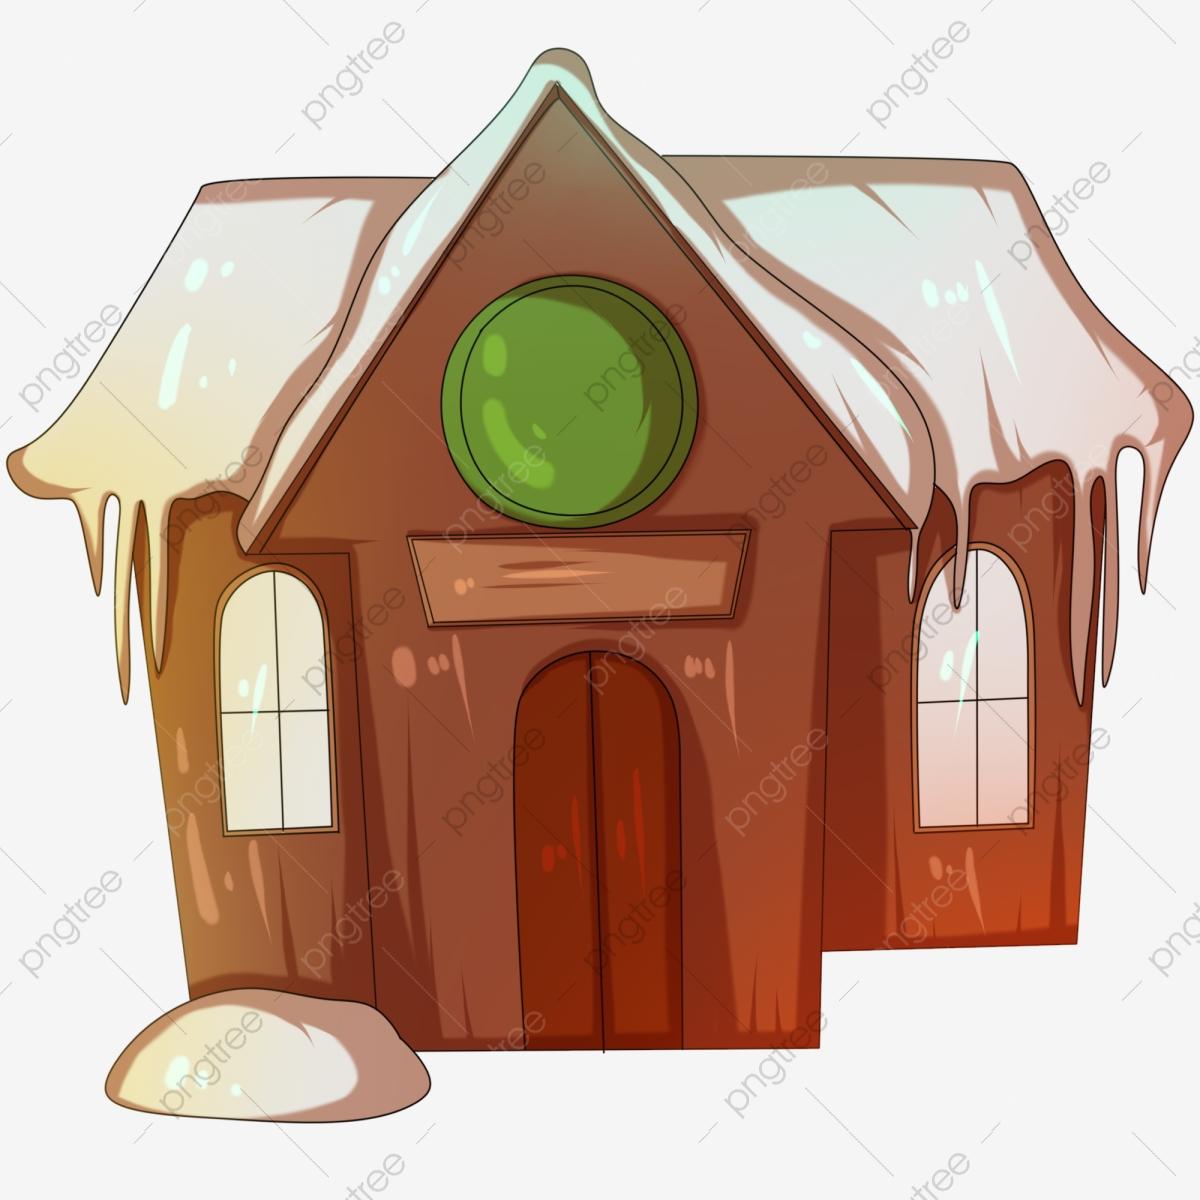 Hut clipart beautiful house. Lovely little snowy illustration